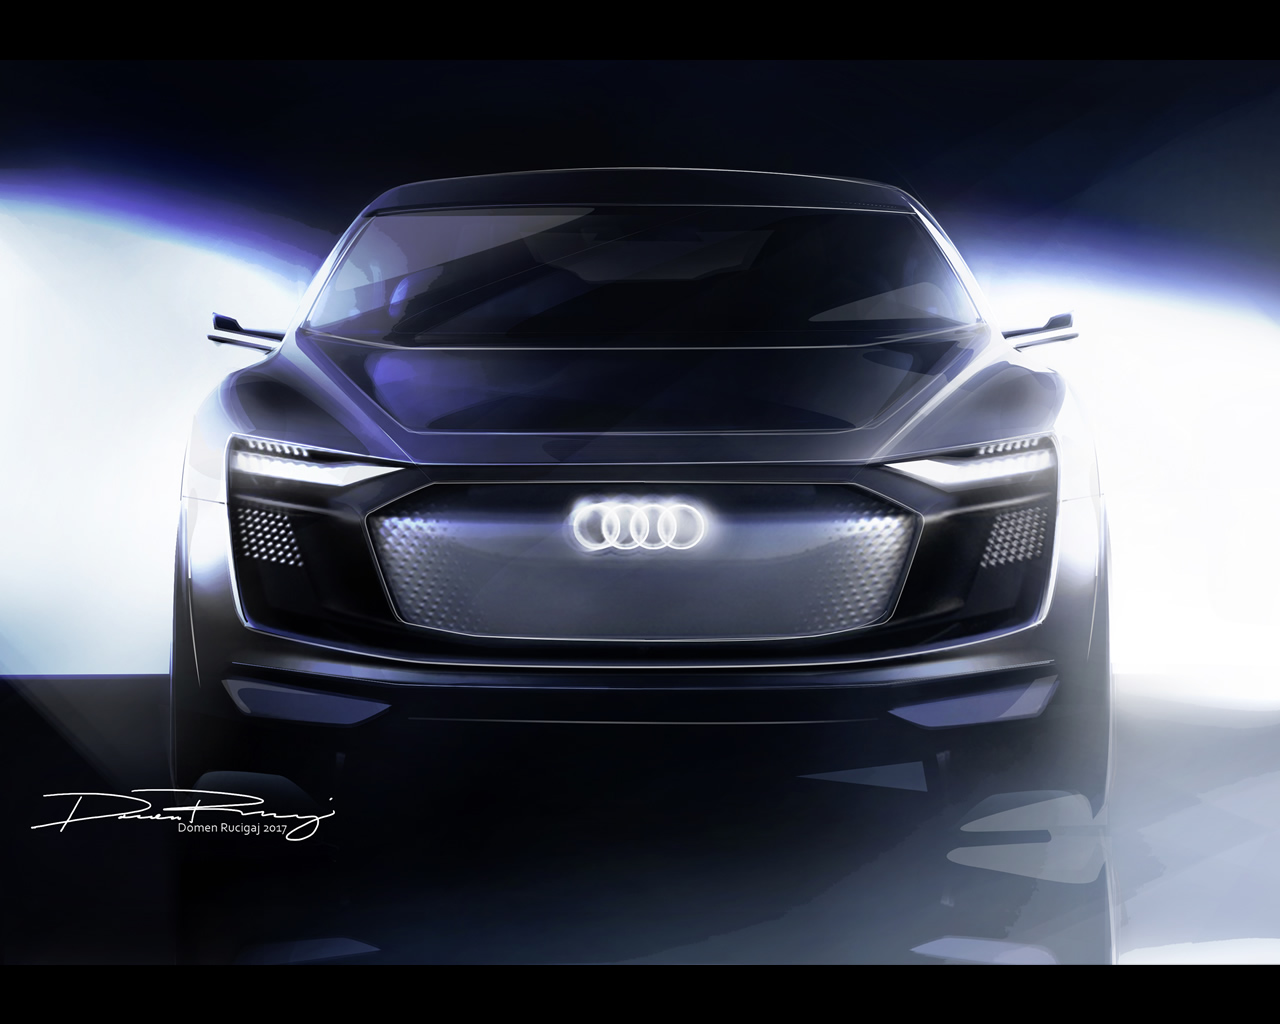 audi e tron sportback concept announced for production in 2019